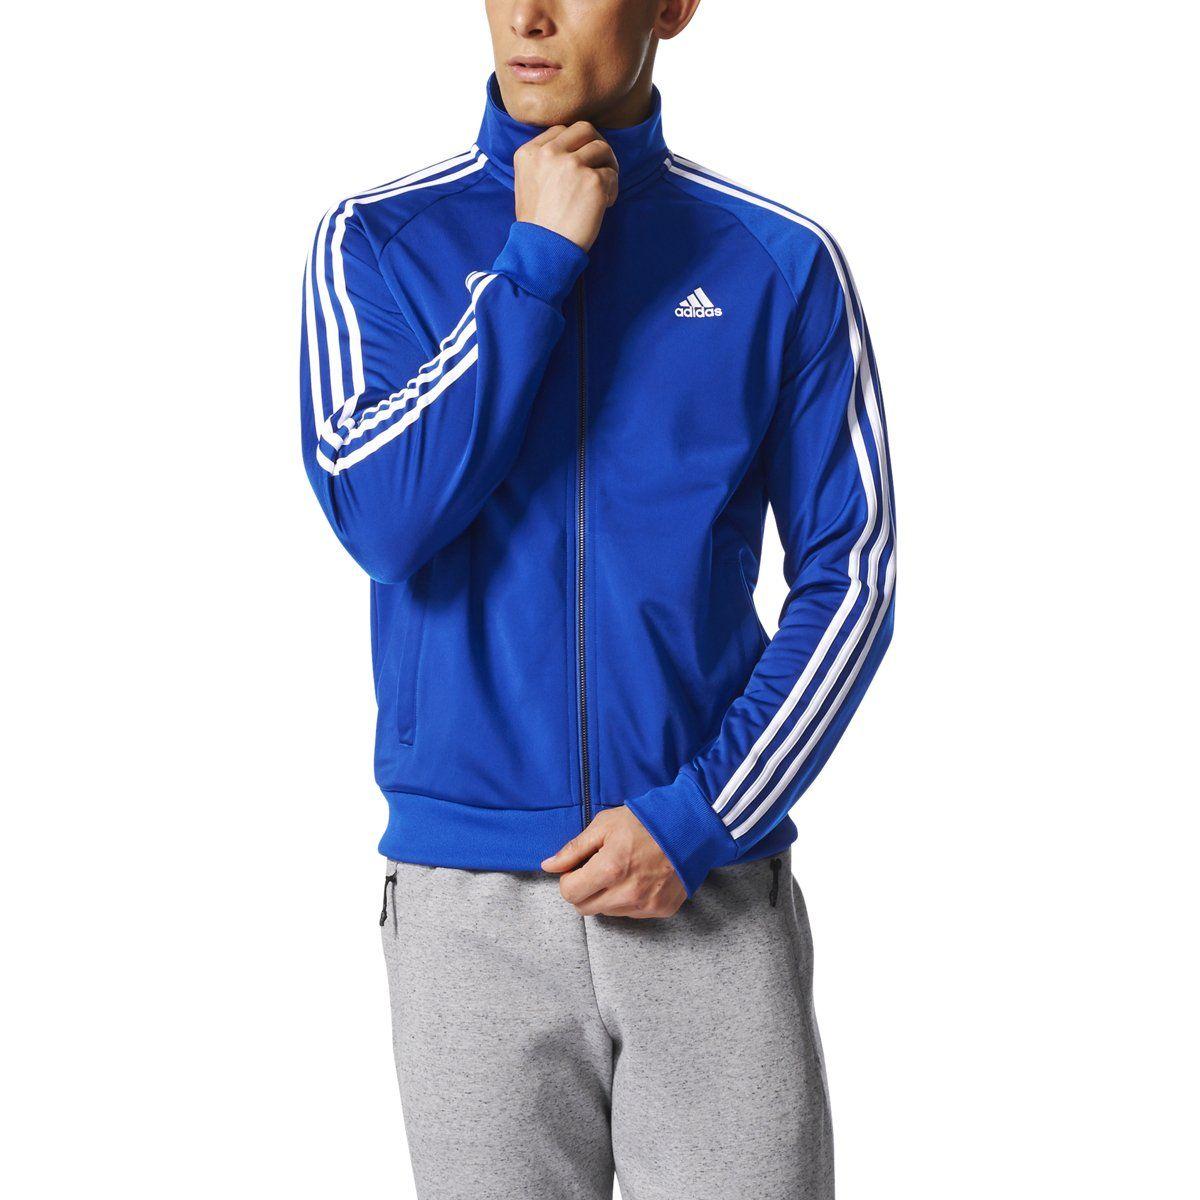 a70319f82372 adidas Essentials 3S Tricot Track Jacket Men's All Sports | CD8760 ...